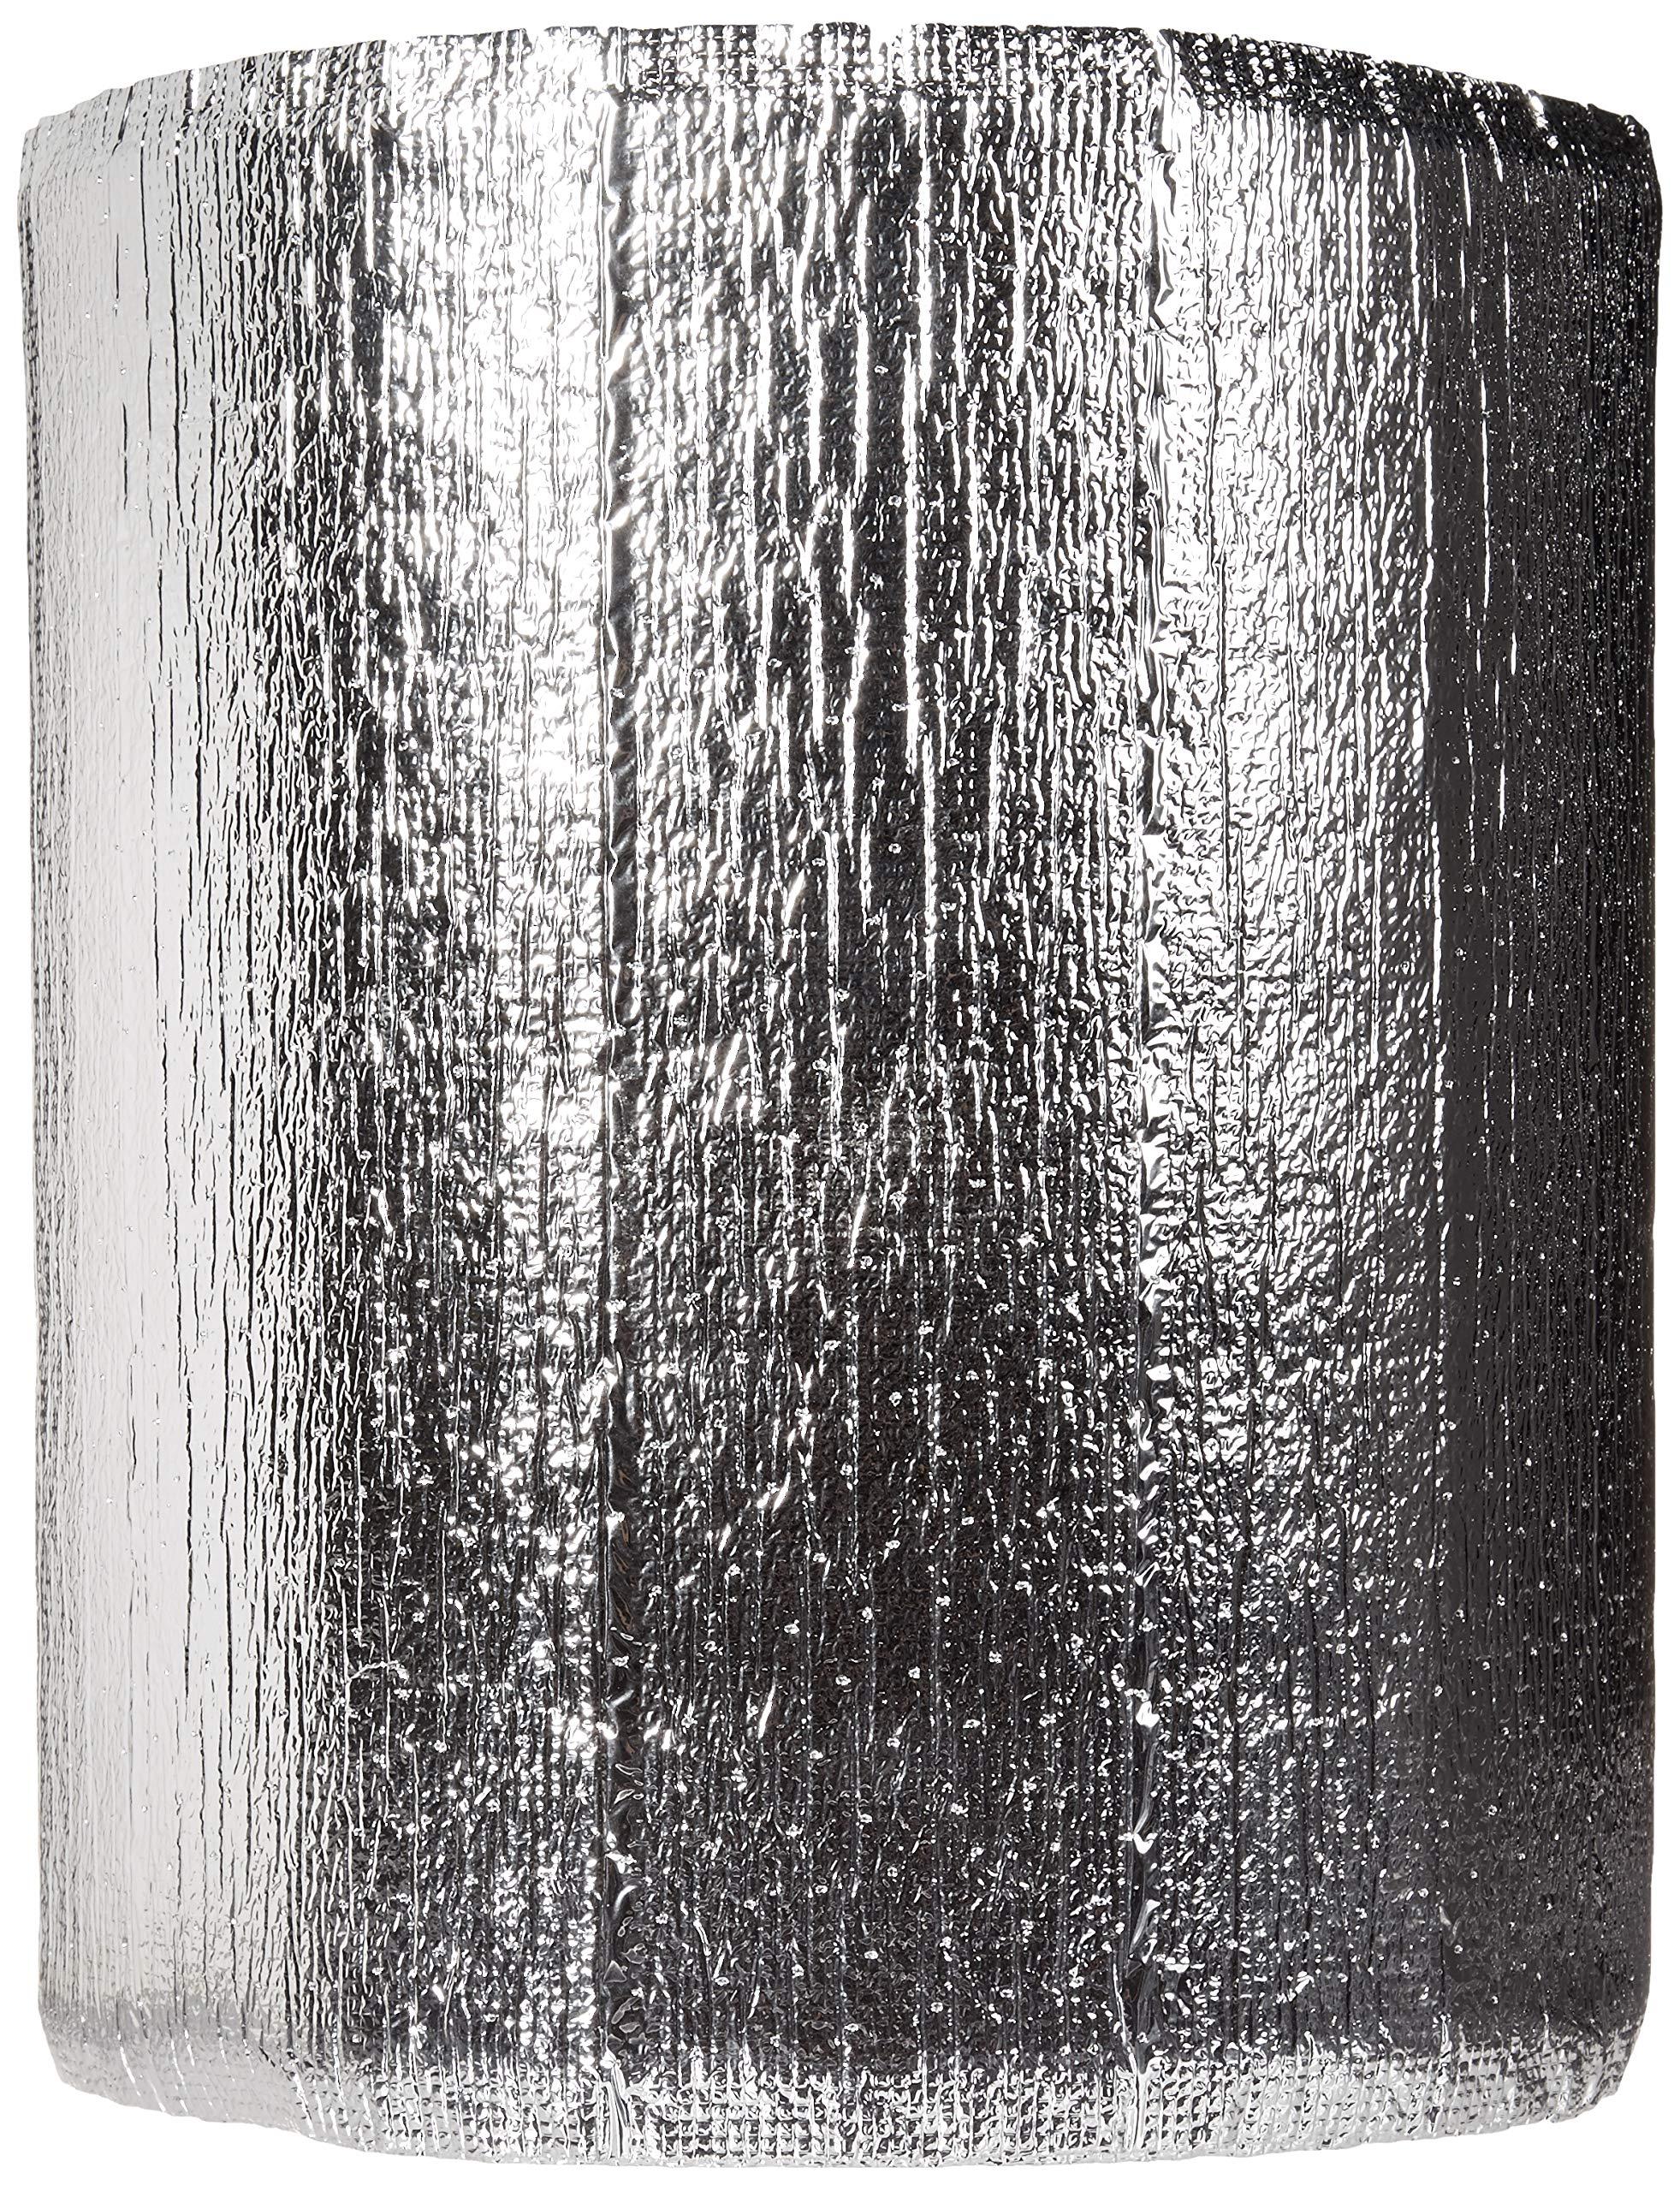 Premium Heat Reflective Insulation Roll (12'' x 50') Reflective Aluminum Insulation Roll with Foam for Walls, Attics, Air Ducts, Windows, Radiators. HVAC and Garages